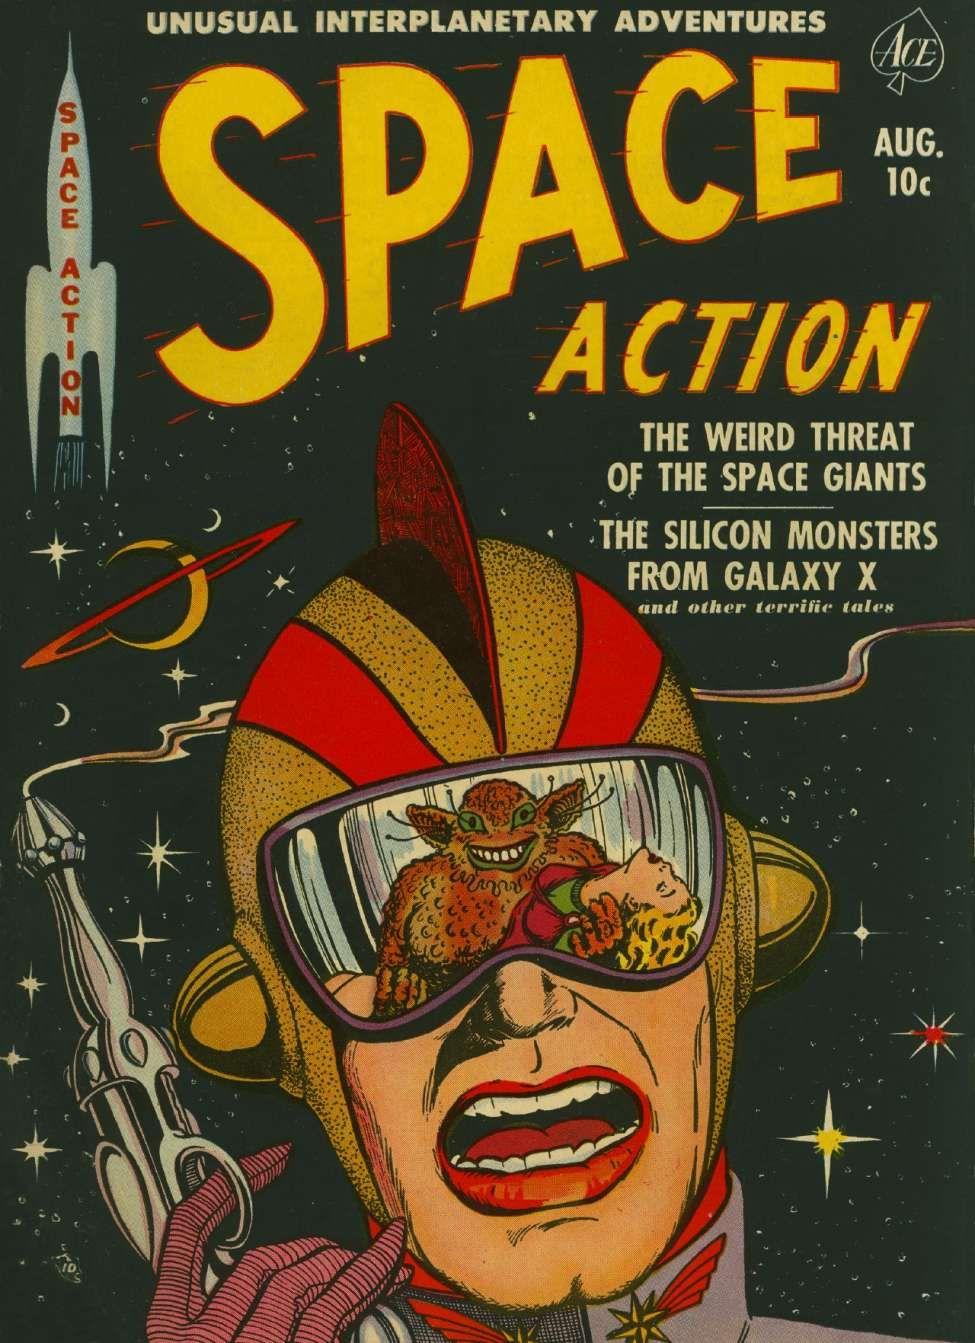 Space Action 2 Ace Comics Comic Book Plus Book Cover Art Vintage Comic Books Vintage Comics